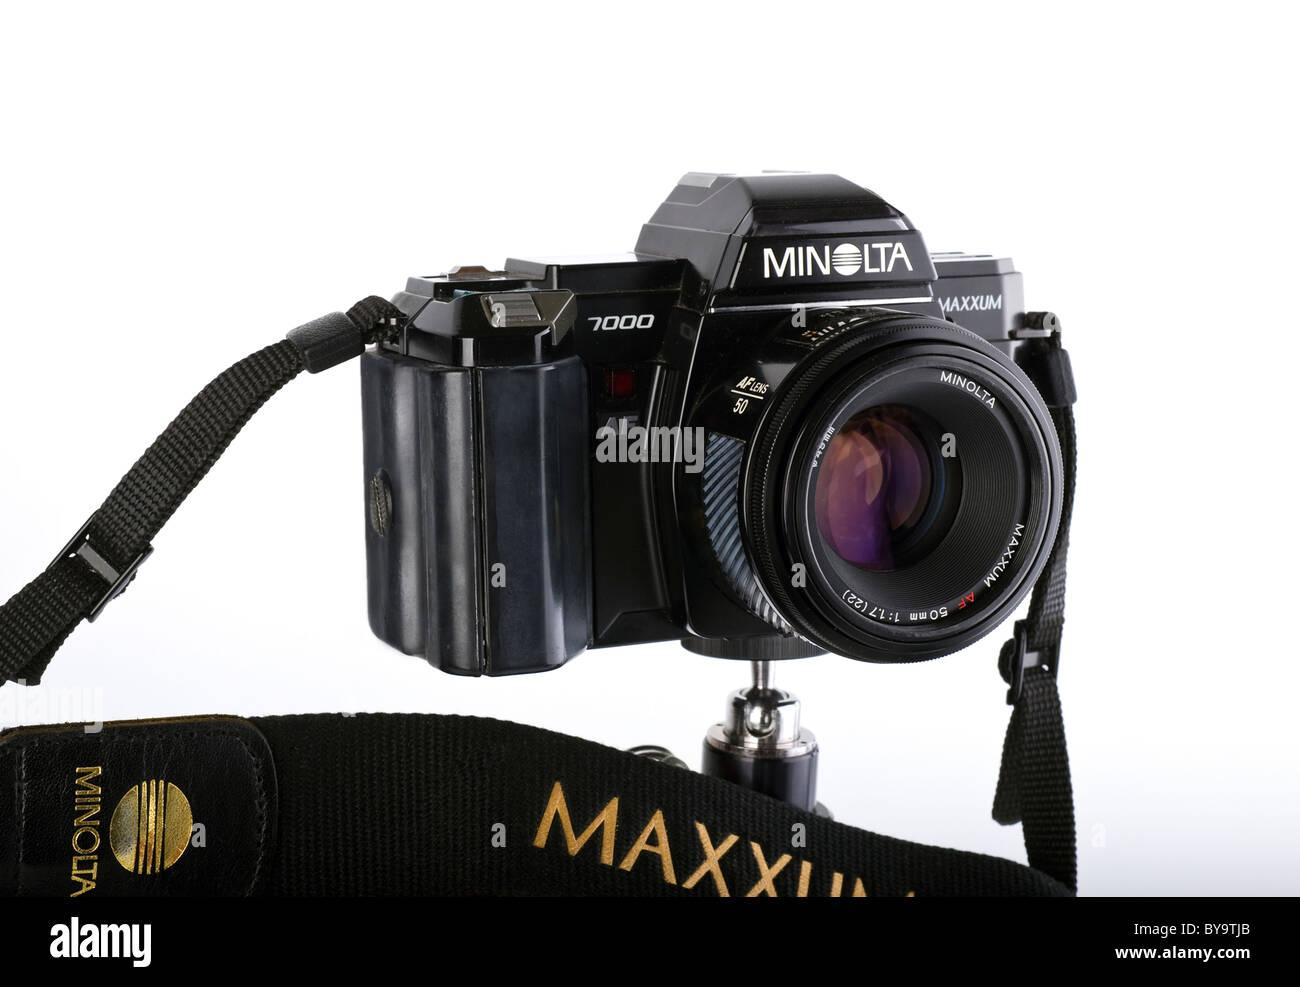 Vintage Minolta Maxxum 7000 35mm film camera strap and lens on white background. Stock Photo